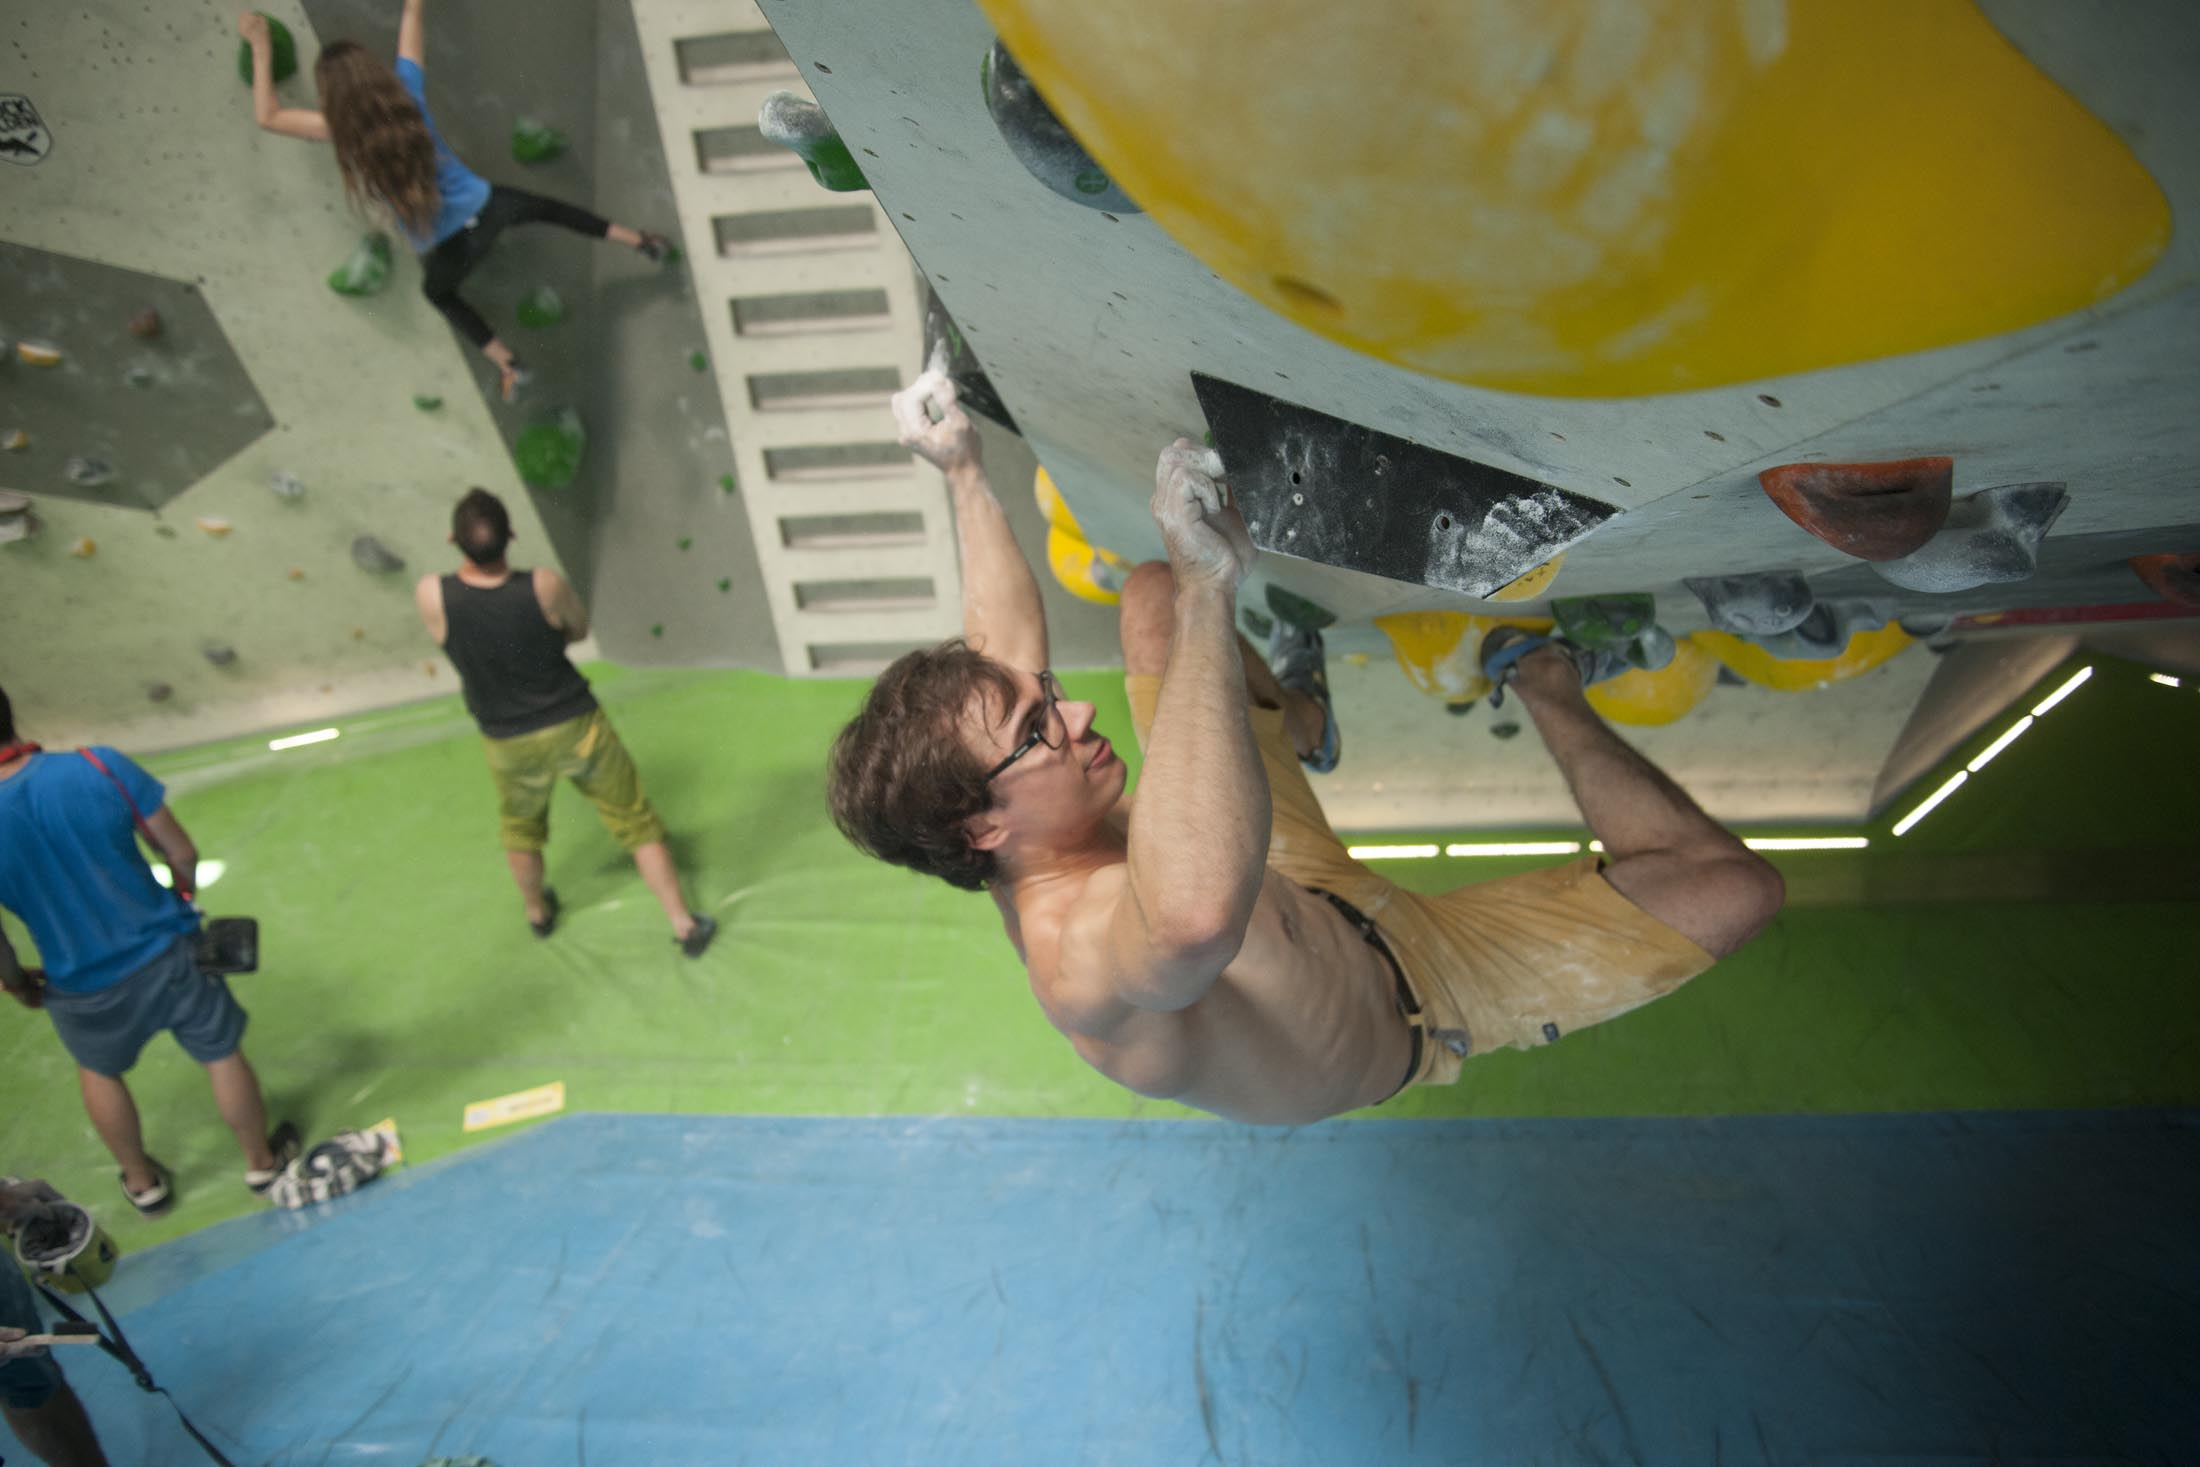 Quali, internationaler bouldercup Frankenjura 2016, BLOCKHELDEN Erlangen, Mammut, Bergfreunde.de, Boulderwettkampf07092016243